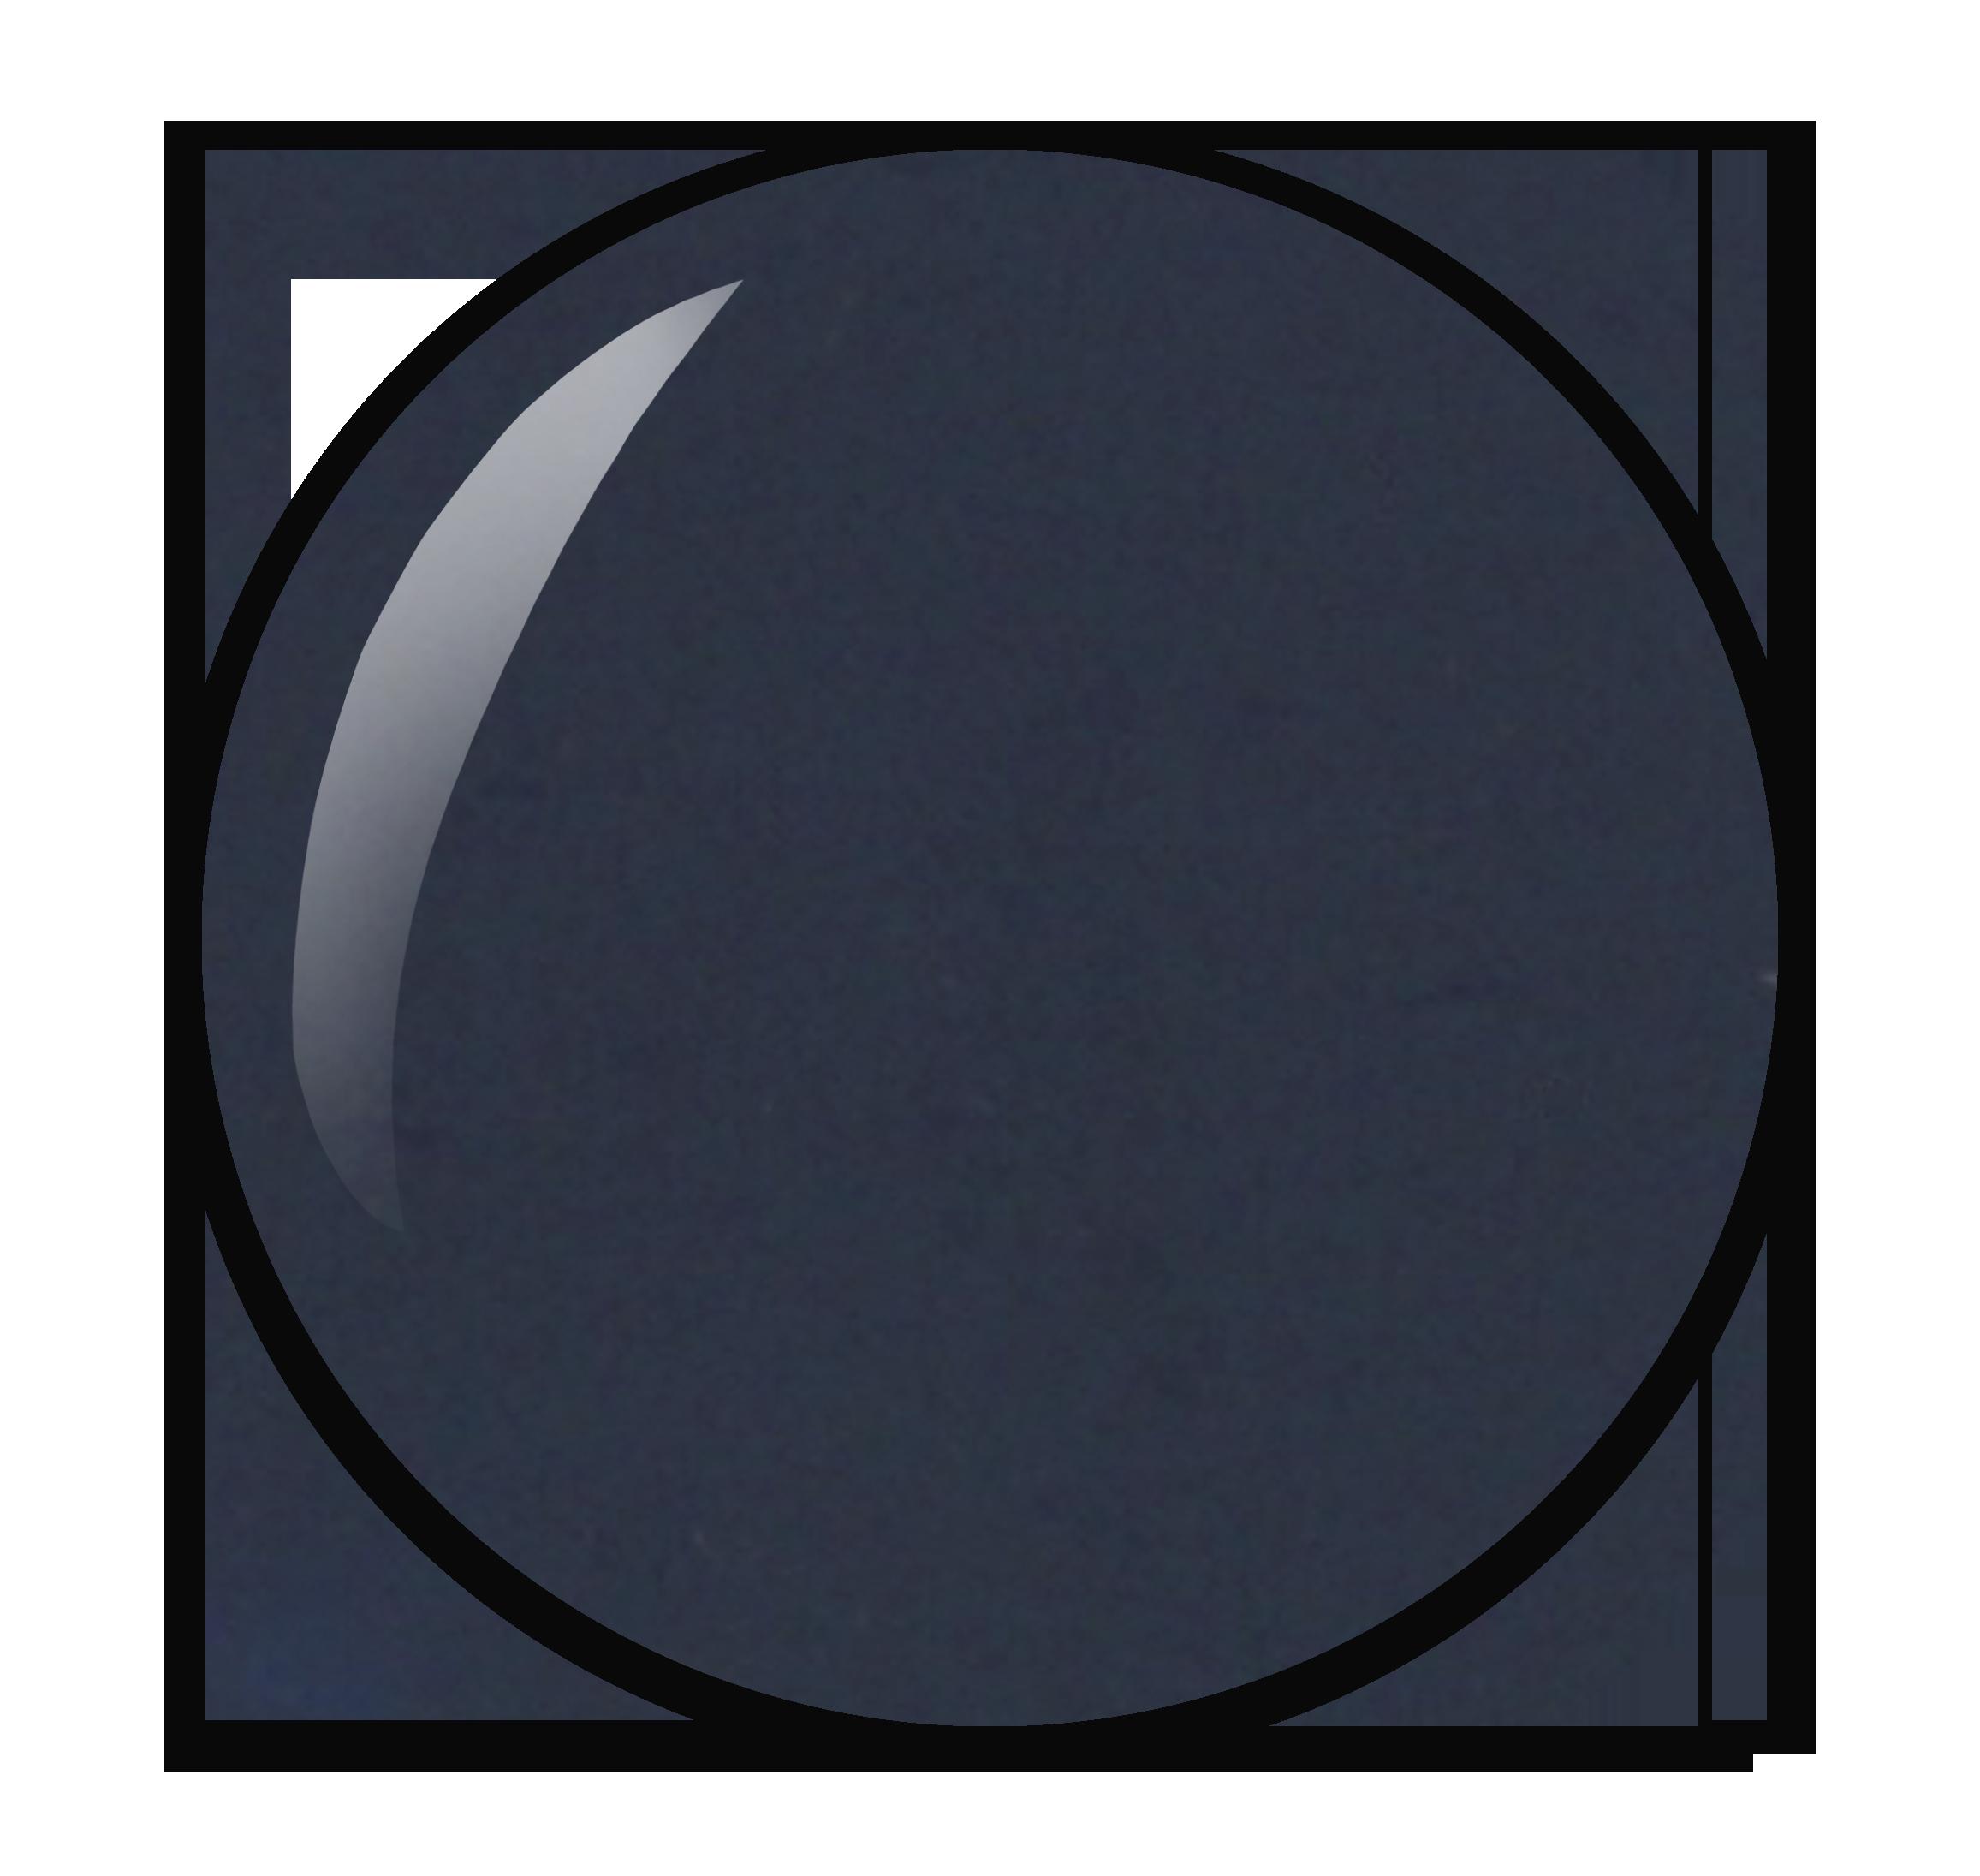 donkerblauwe nagellak kleurnummer 160 van de Herôme nagellak kleuren